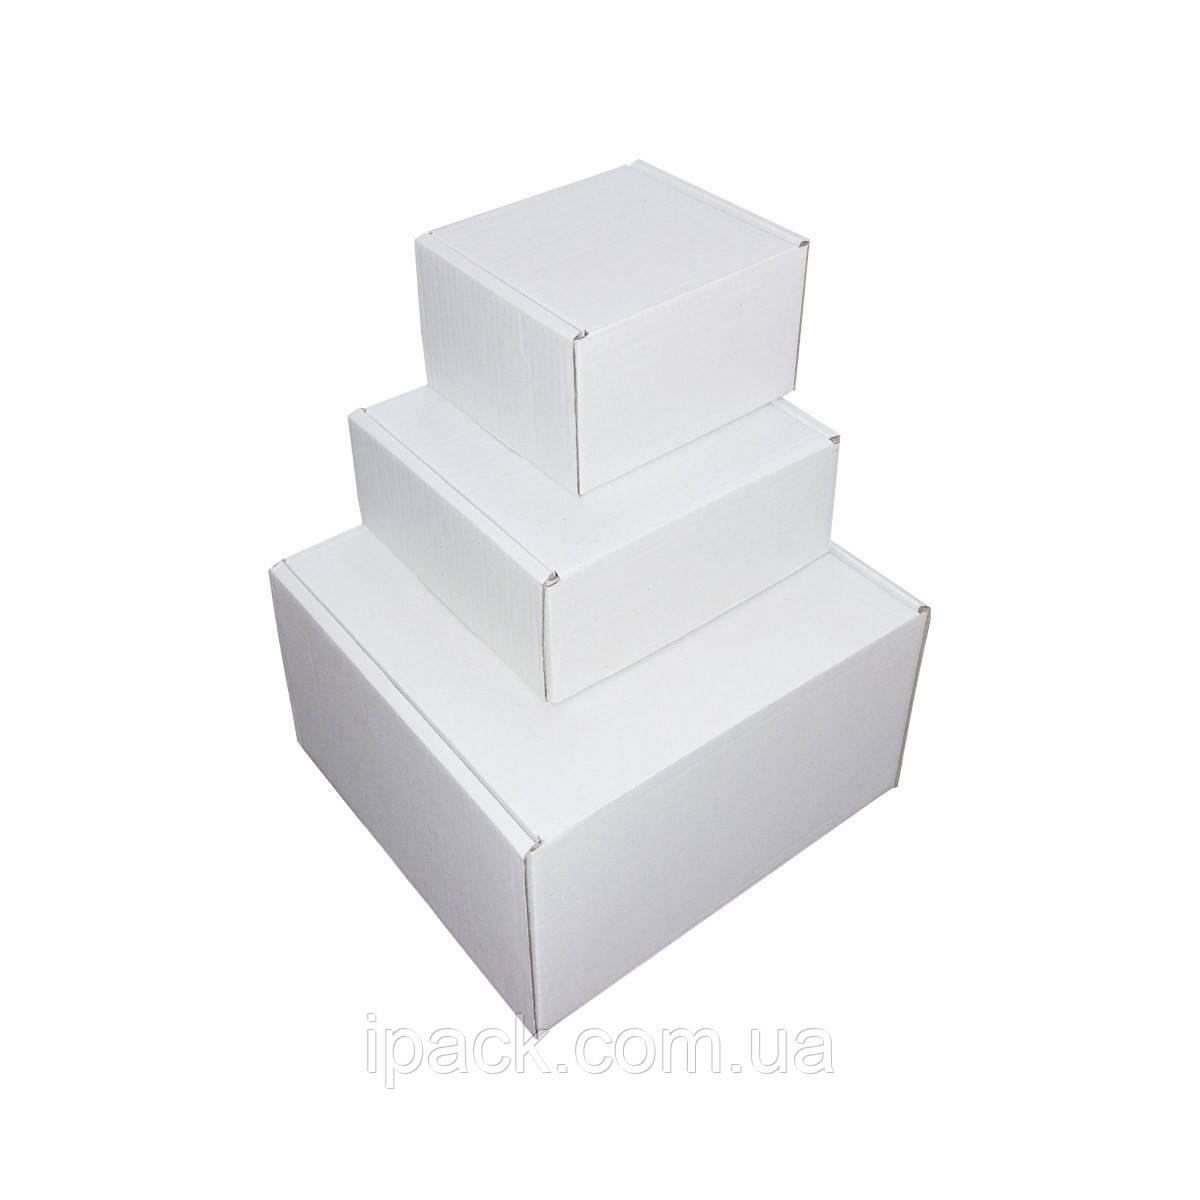 Коробка картонная самосборная, 310*210*100, мм, белая, микрогофрокартон